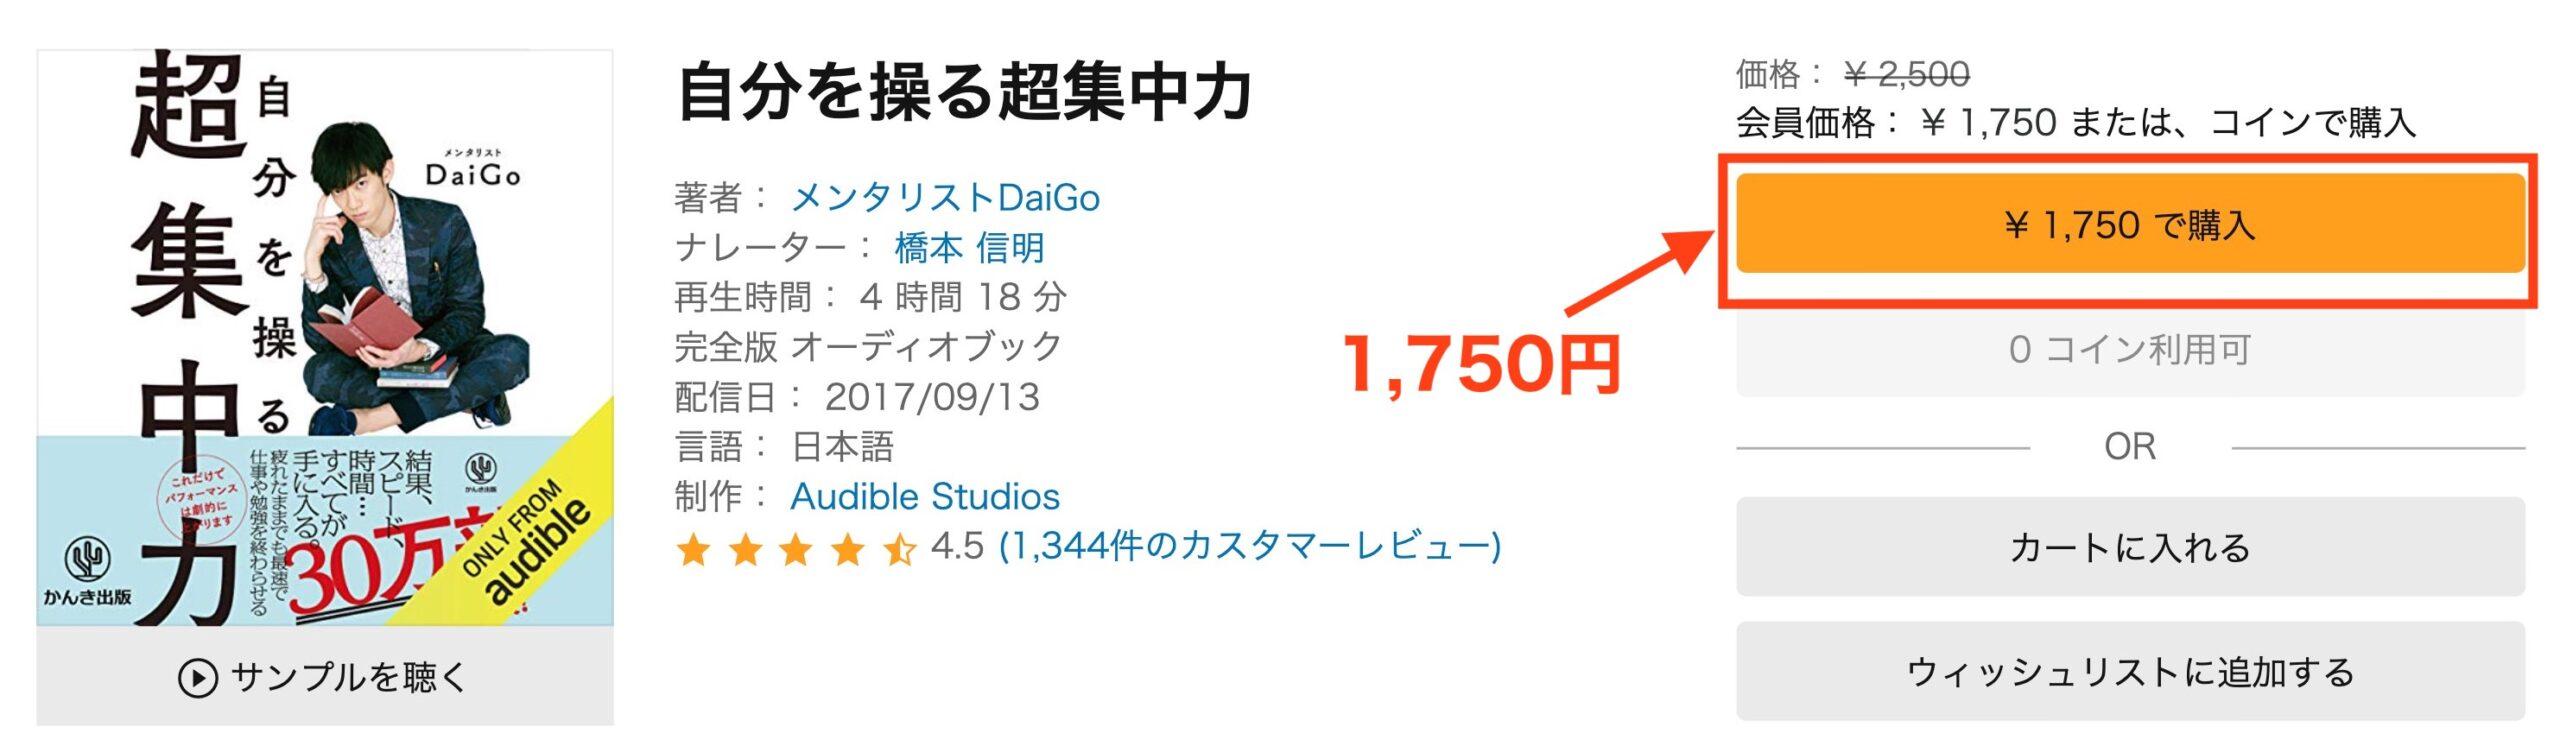 Audibleは1,750円